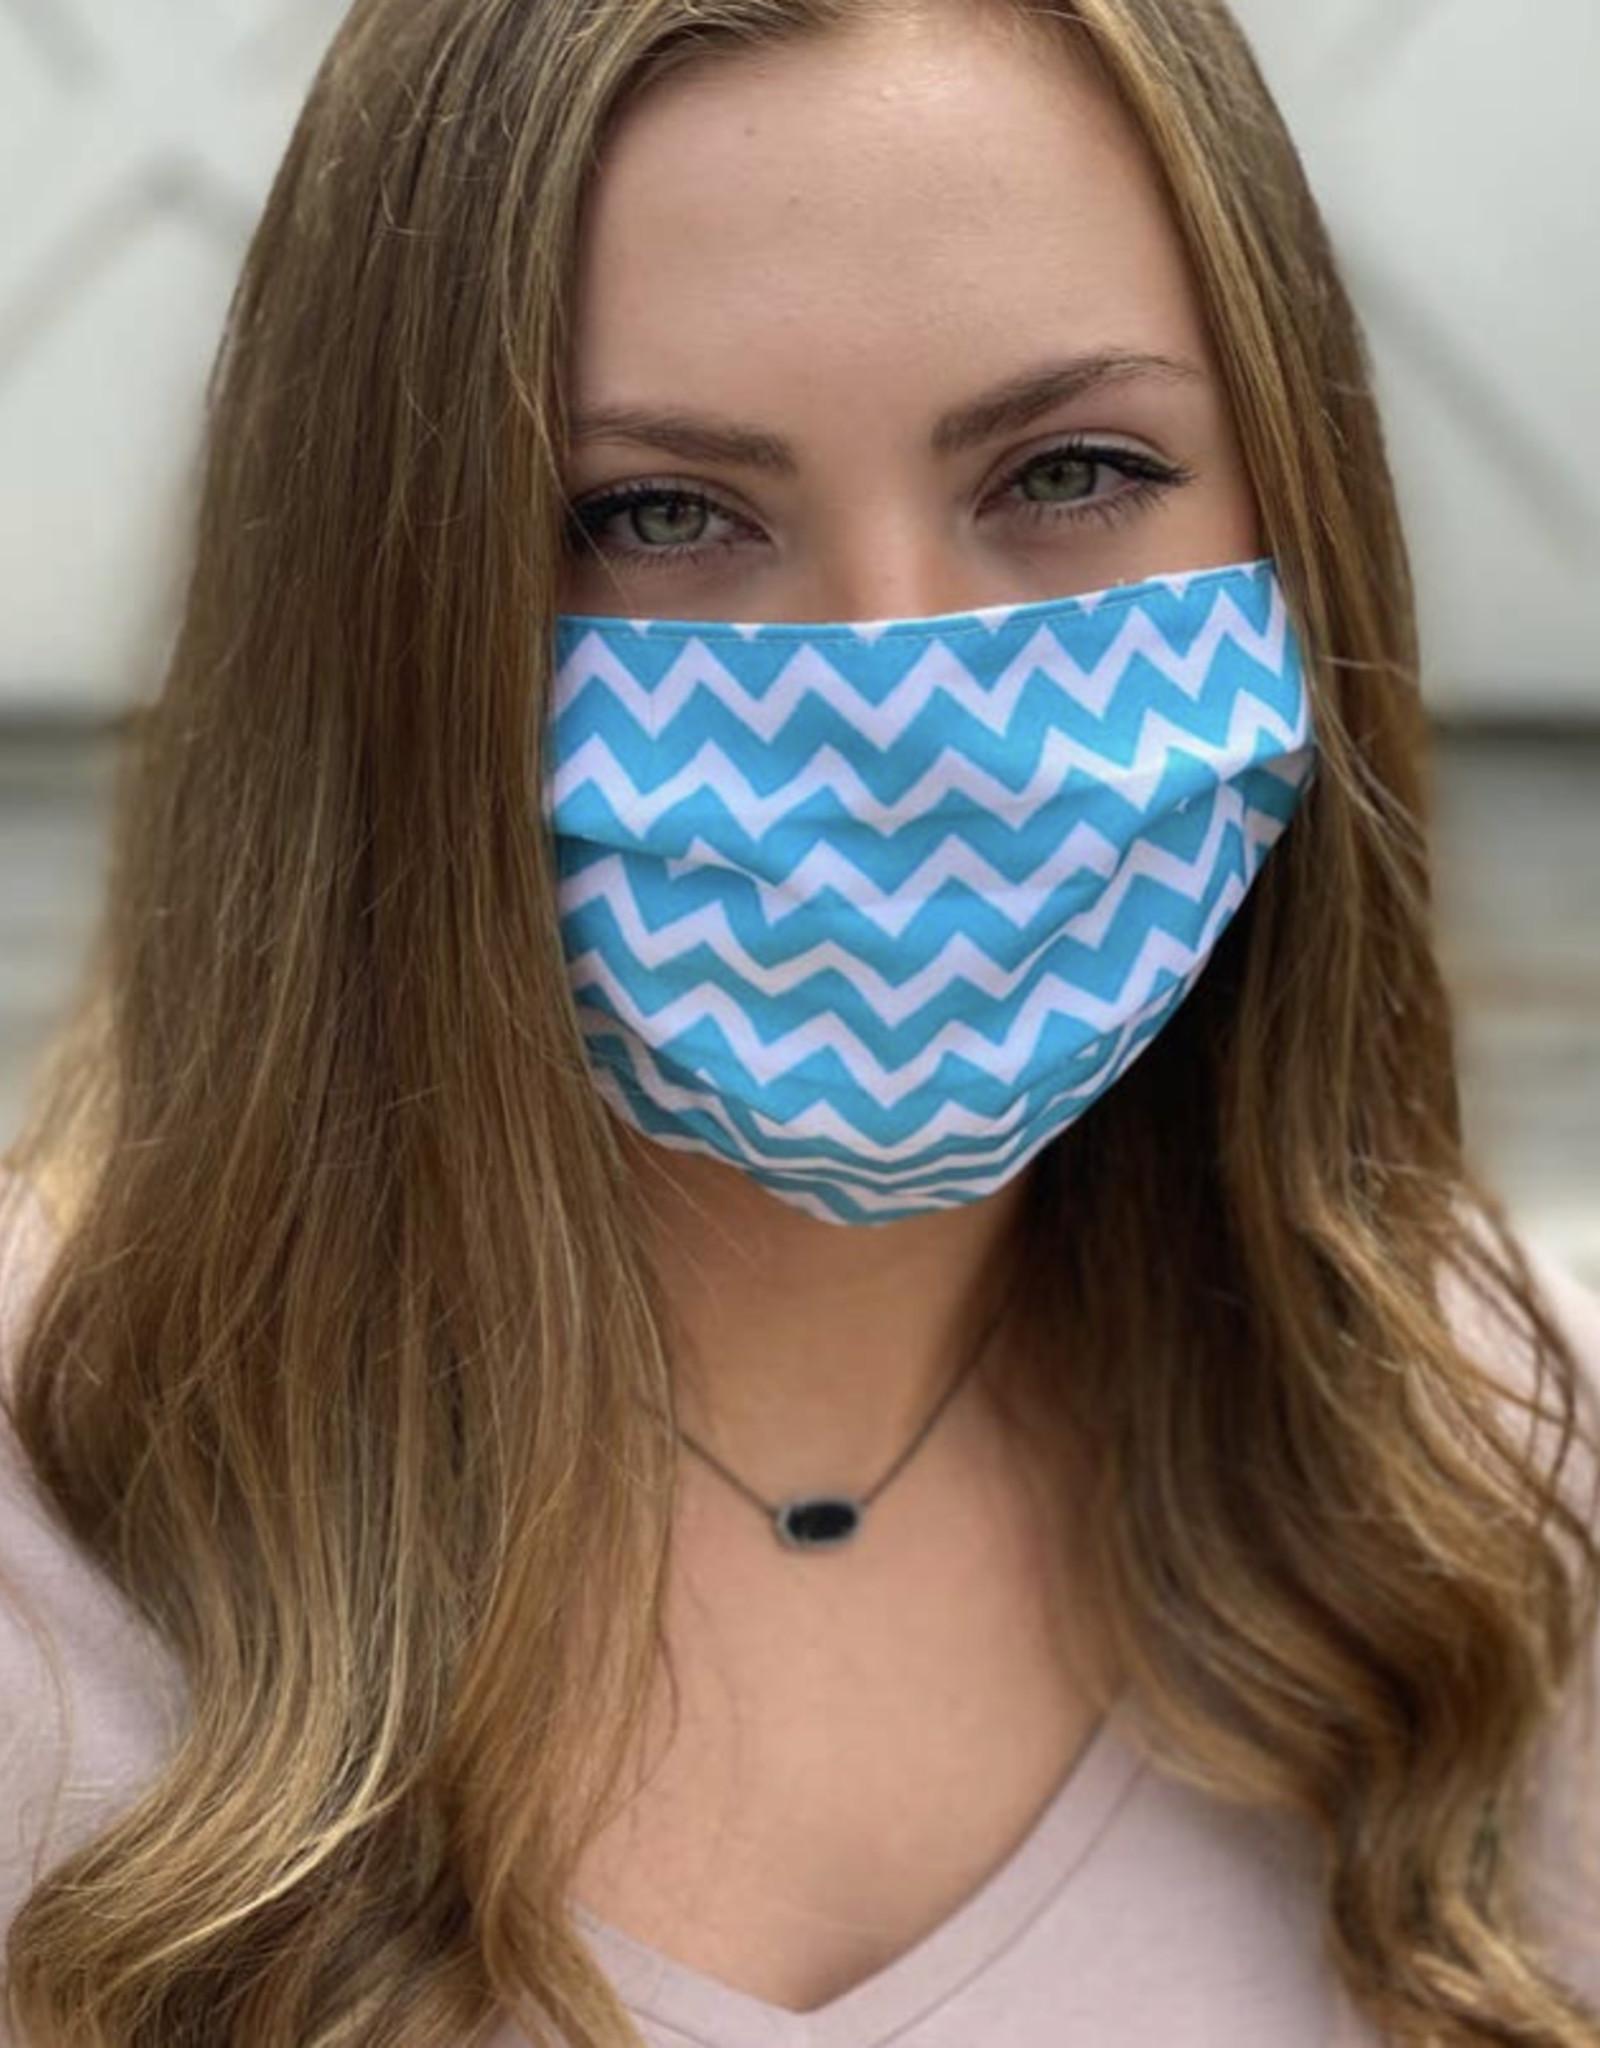 Salt and Palms Chevron face mask